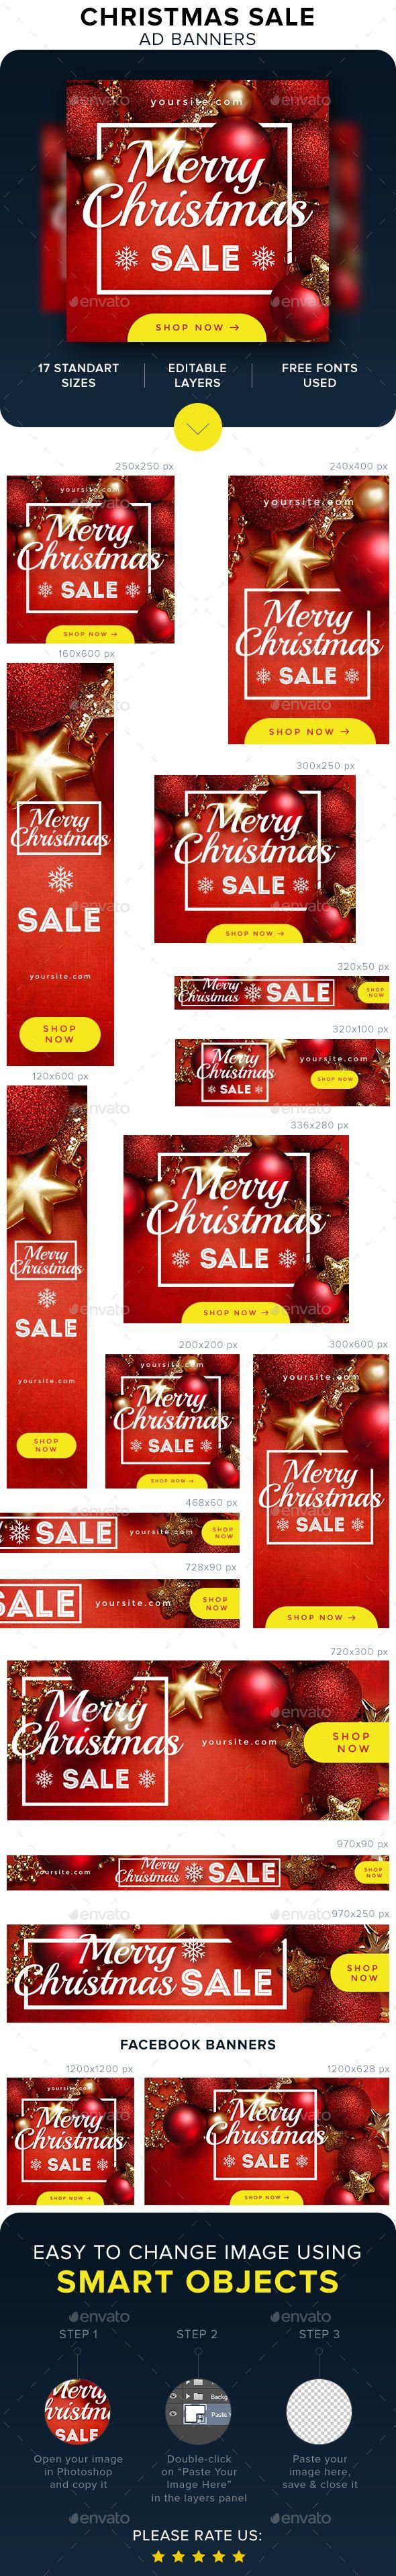 Christmas Sale Banners Template PSD | Banners | Pinterest | Werbung